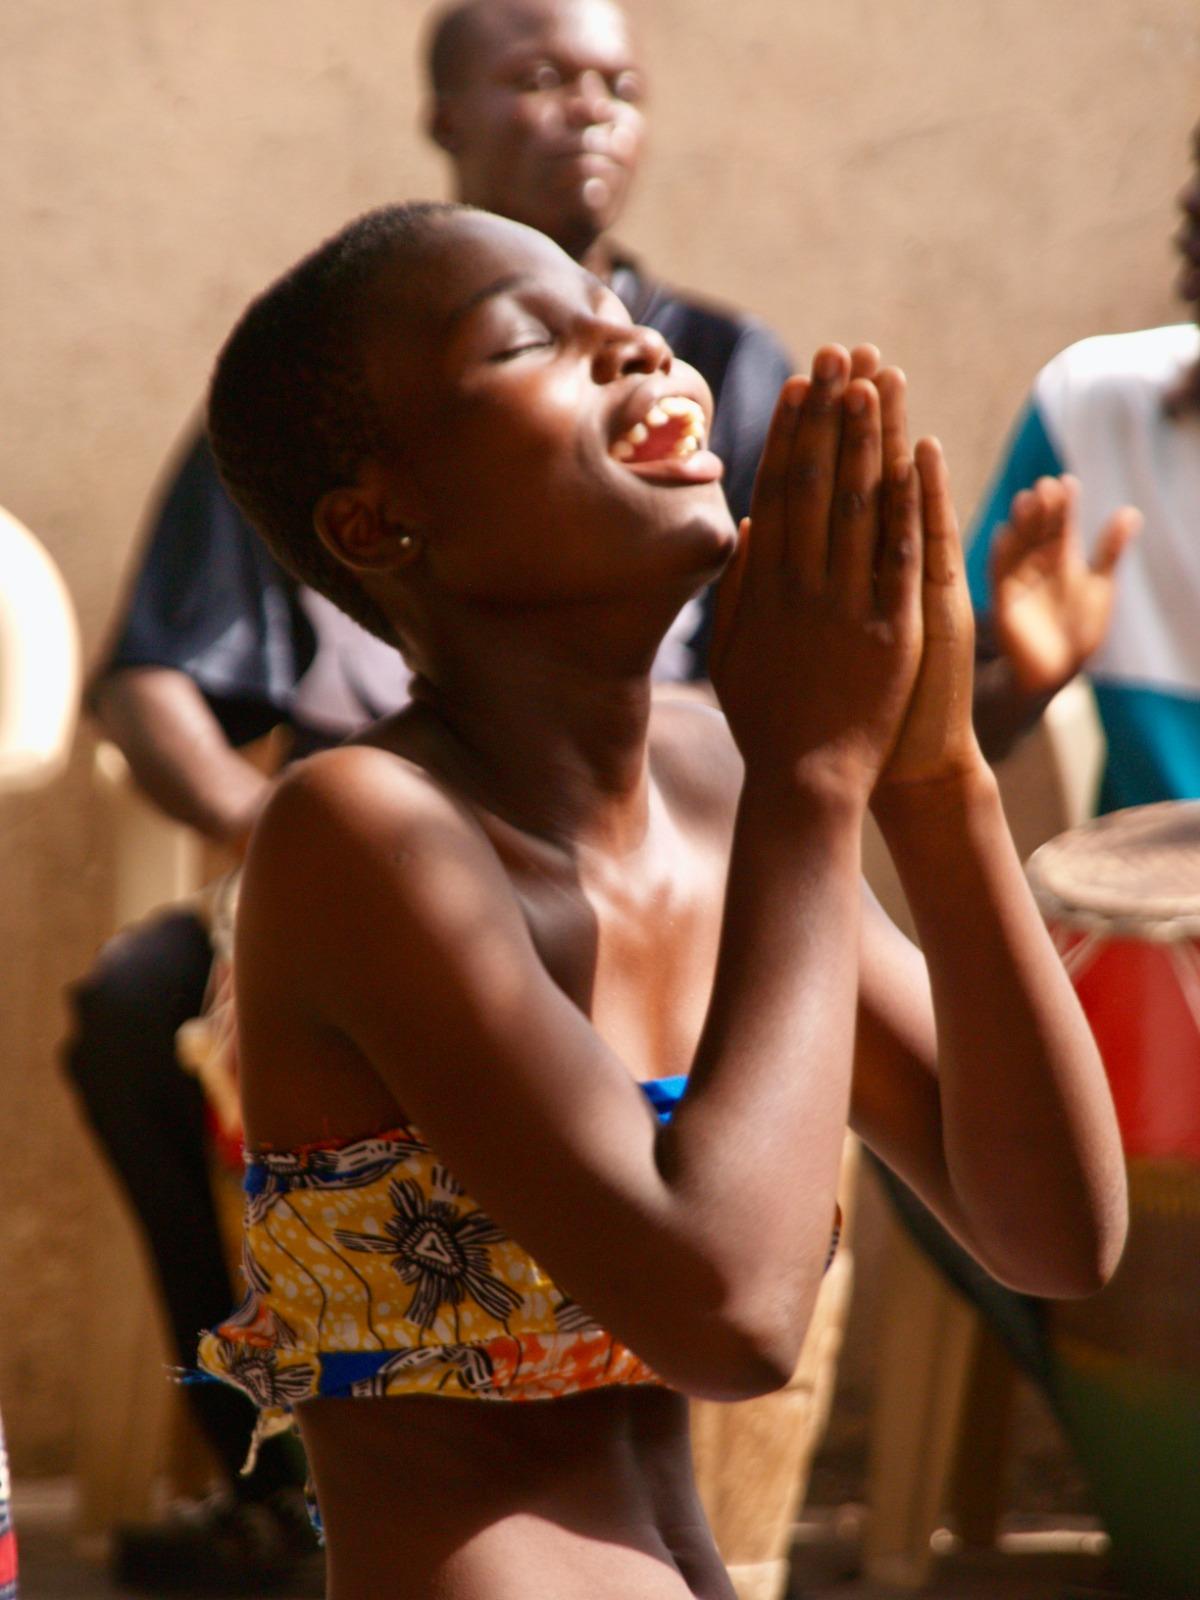 Local Charities Worldwide - The art of giving.